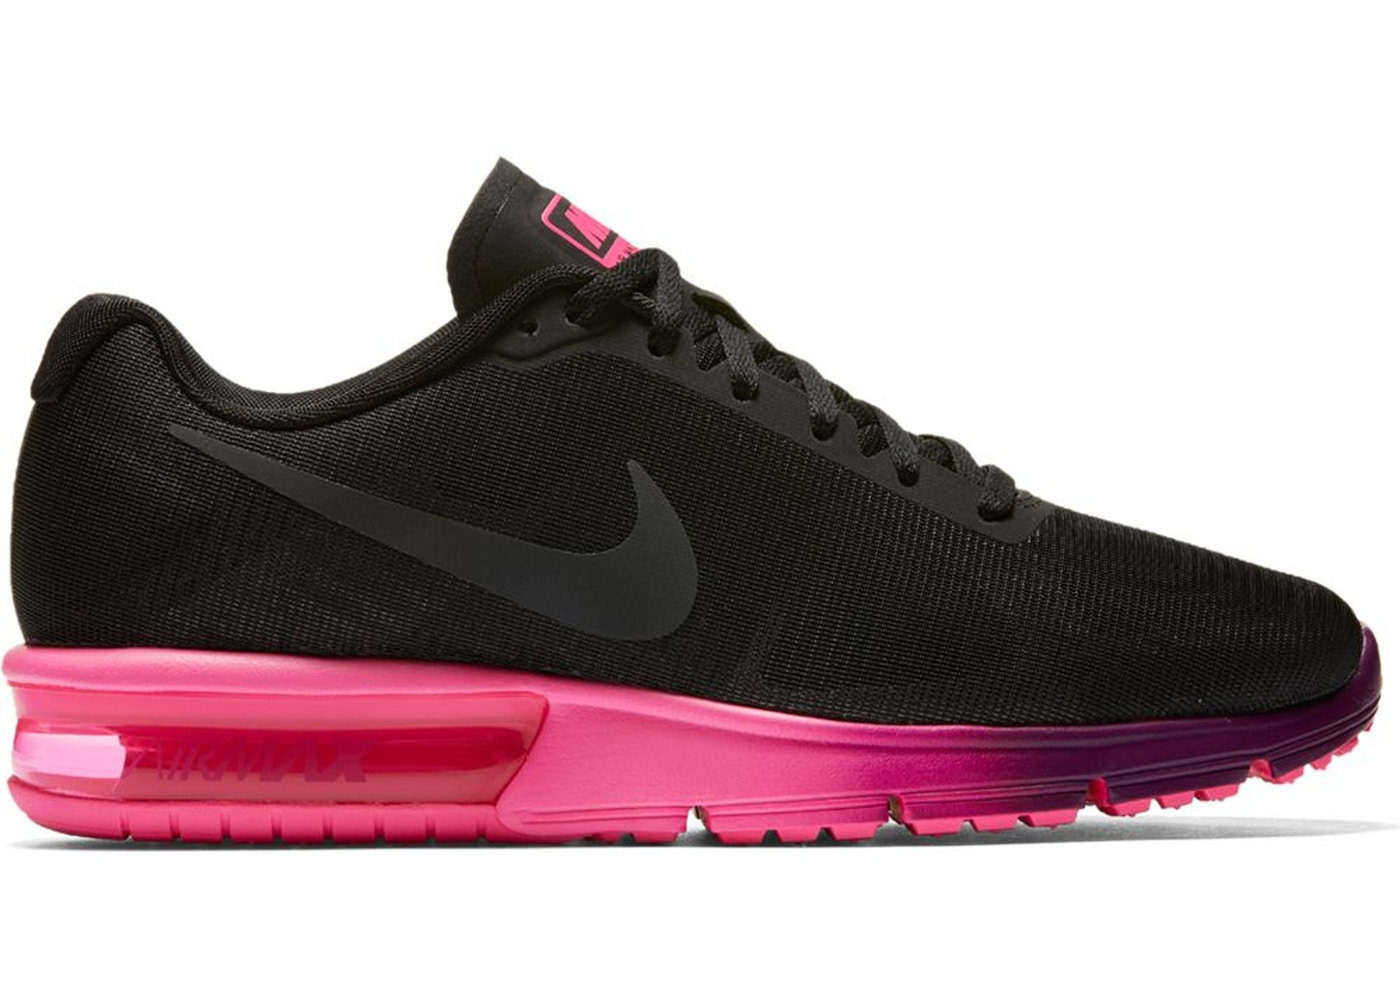 Nike Air Max Sequent Black Pink Blast (W) - 719916-015